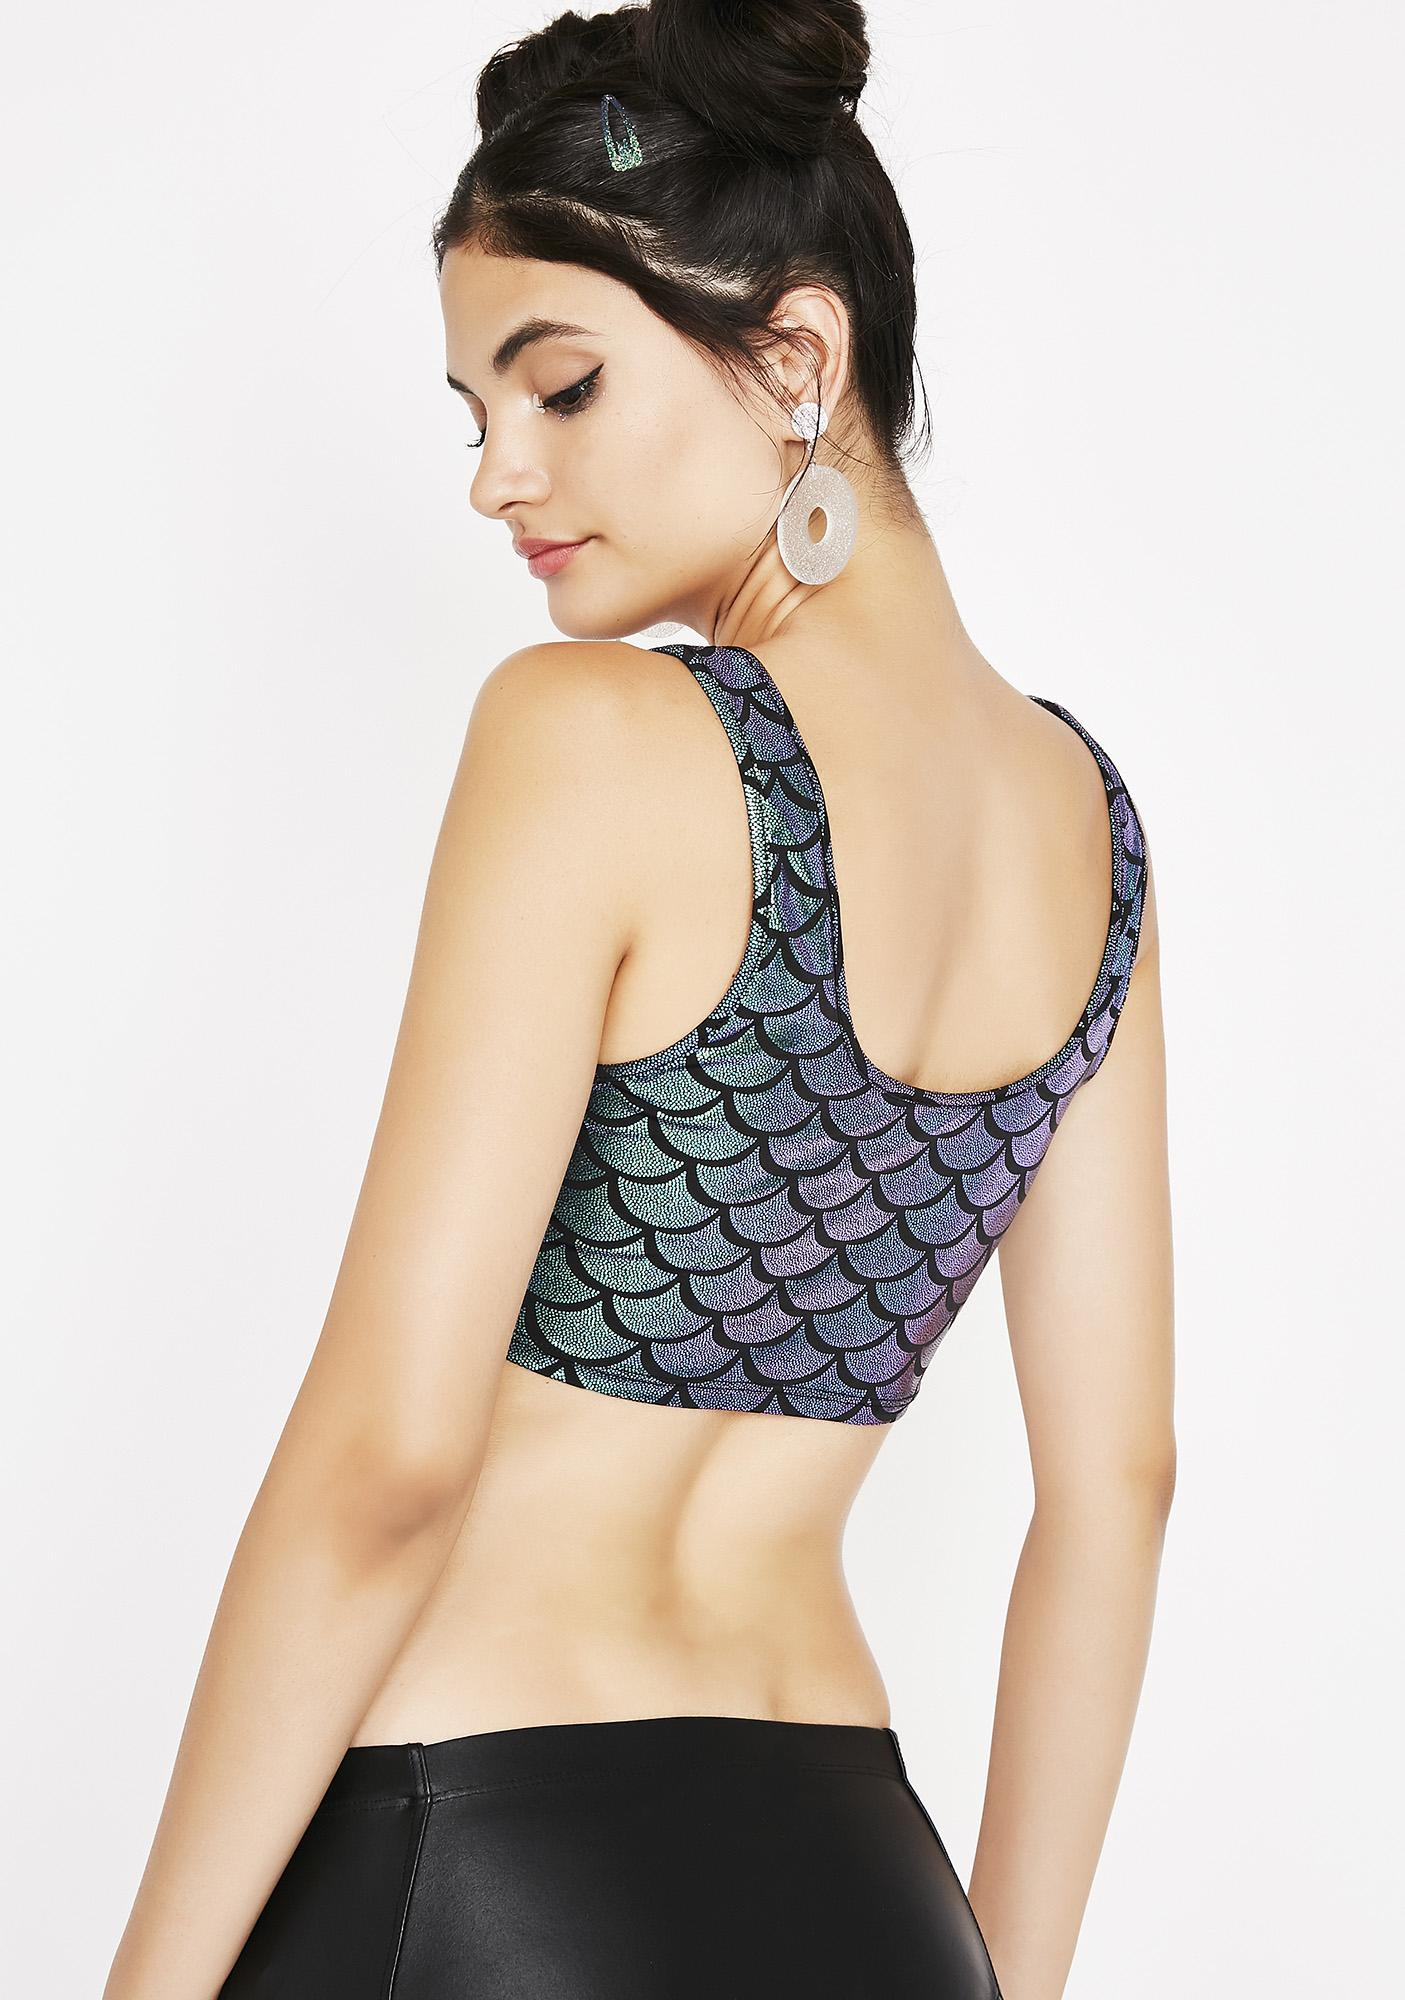 Mermaid Fantasy Crop Top